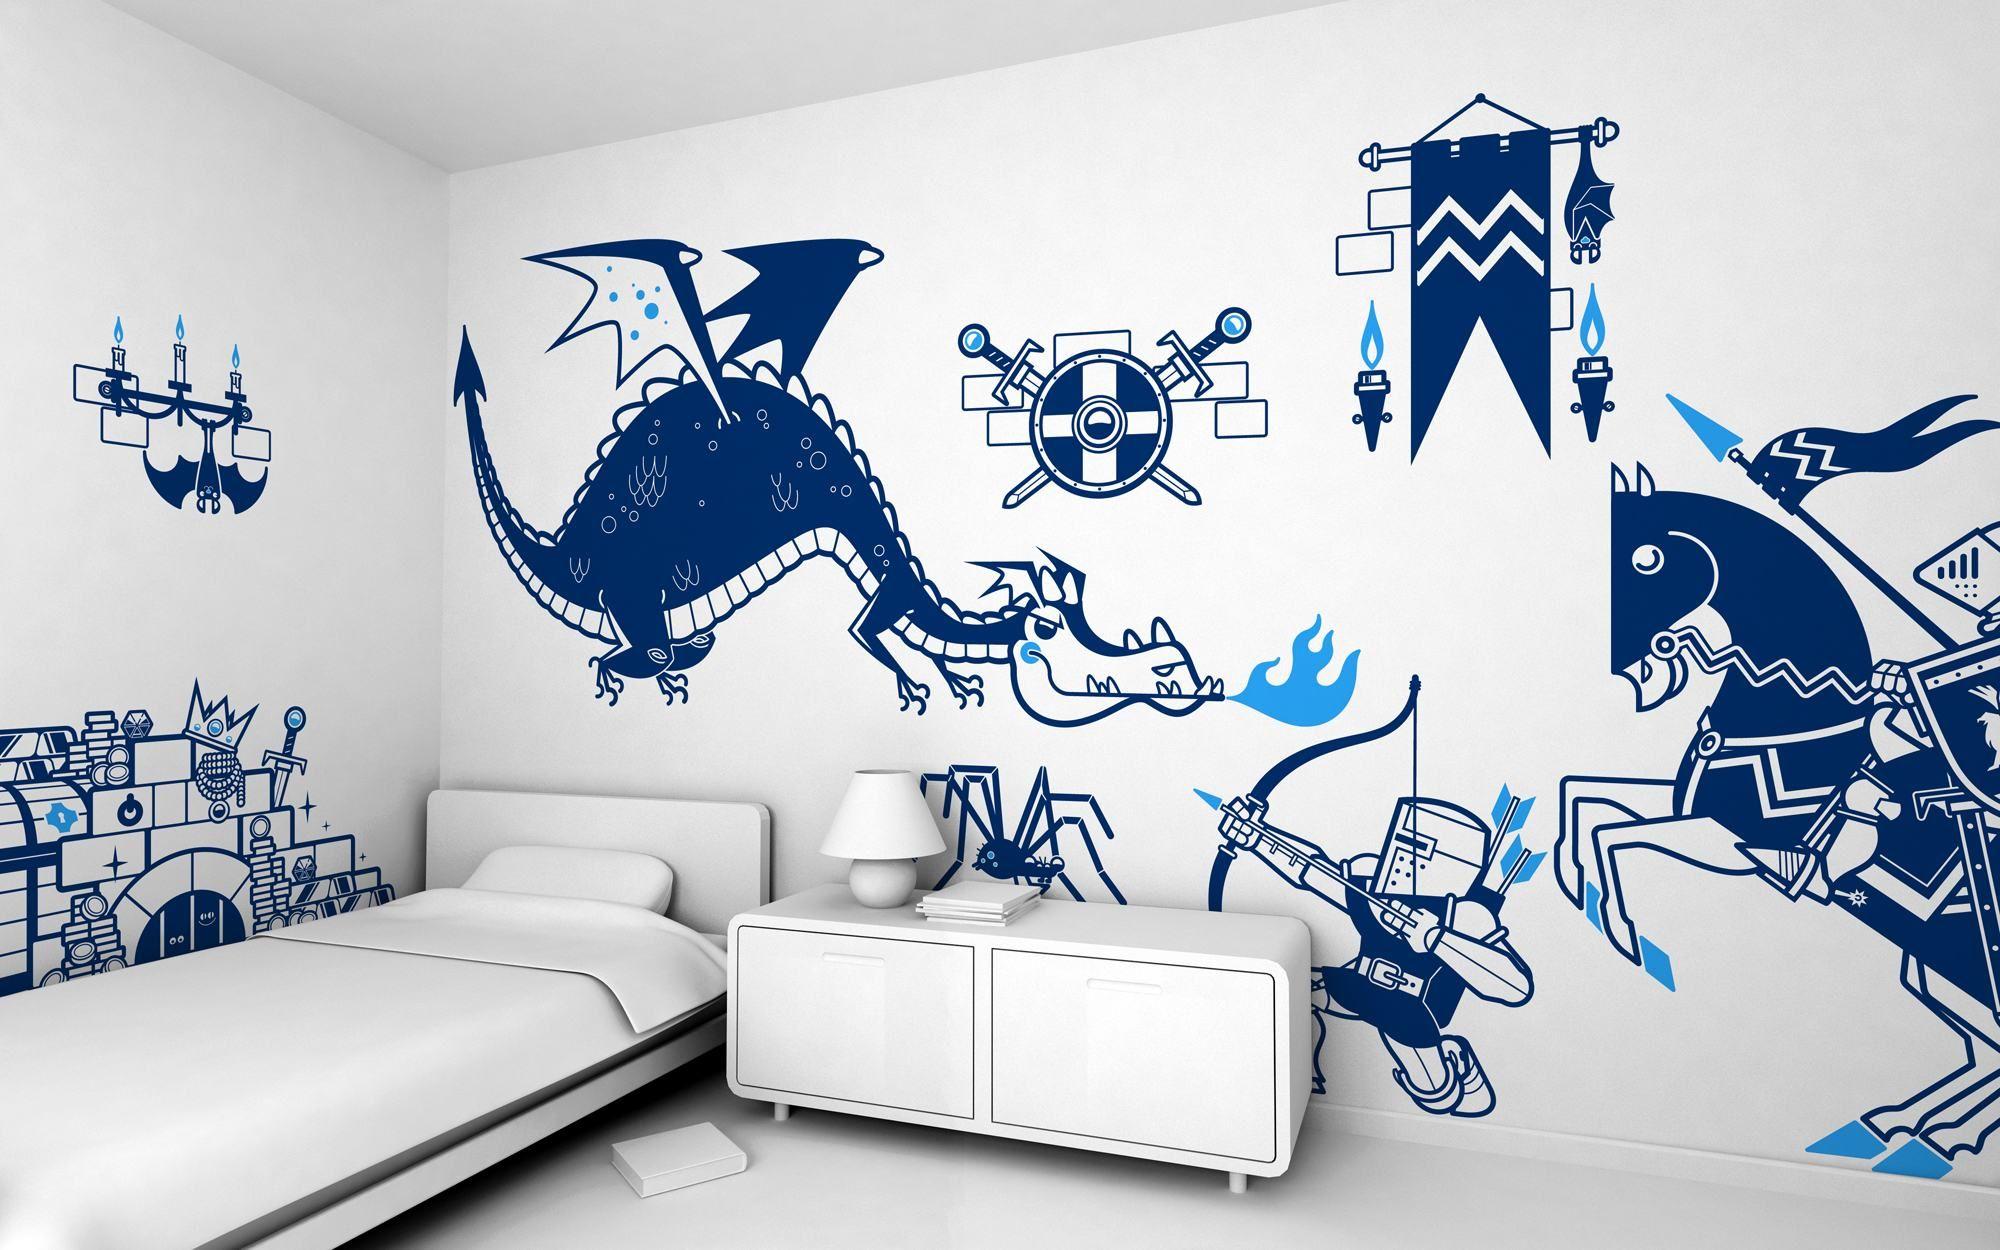 Download Free Wallpaper Knights Dragon pack wall